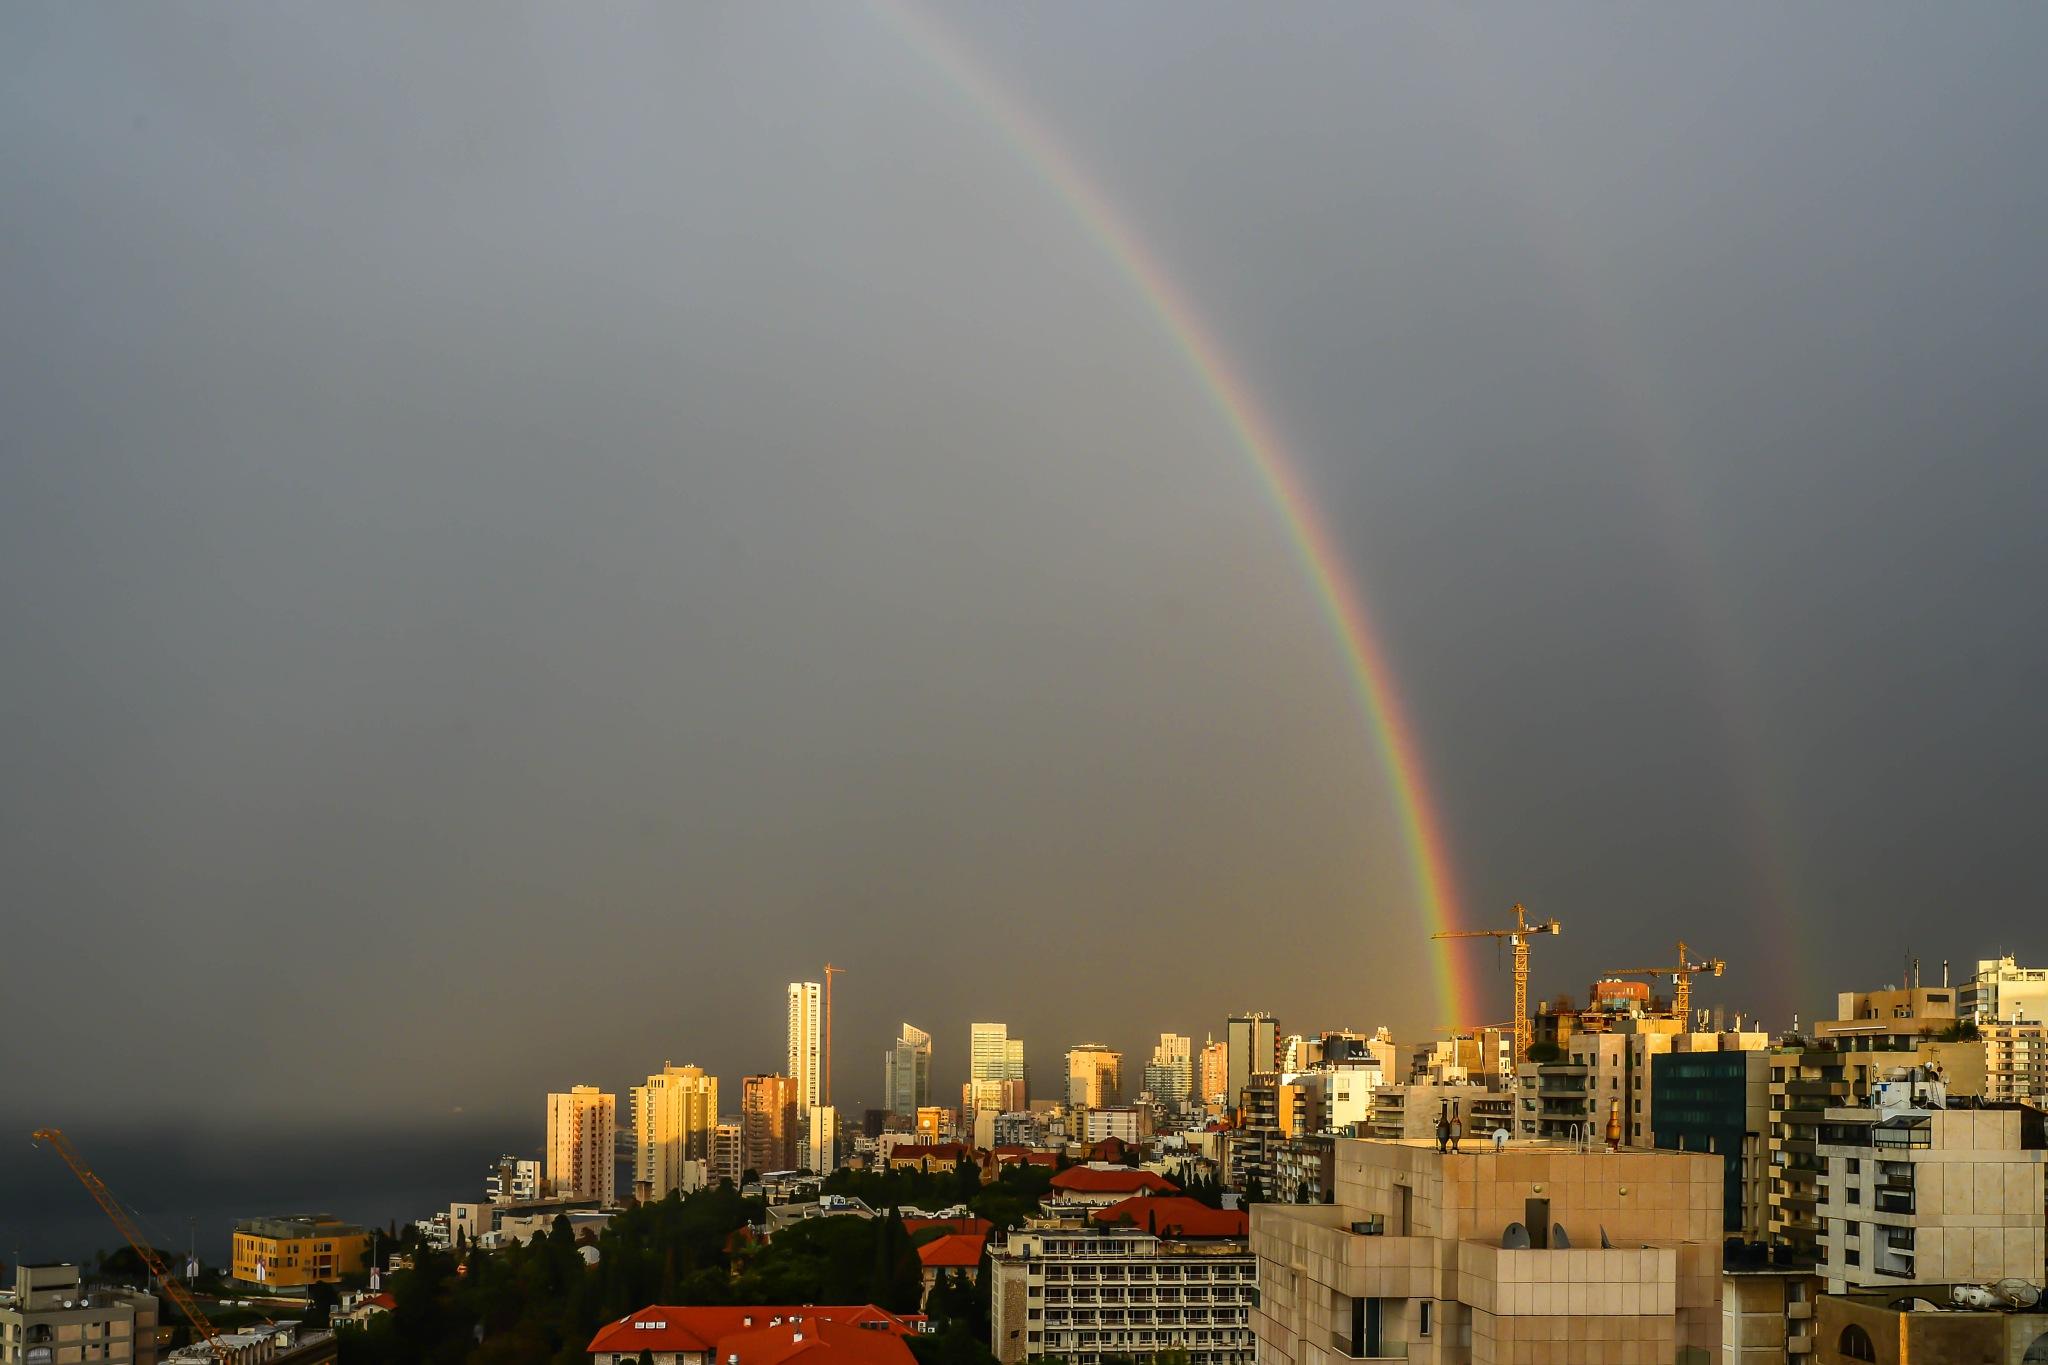 Double Rainbow by muhammad.nasser.963